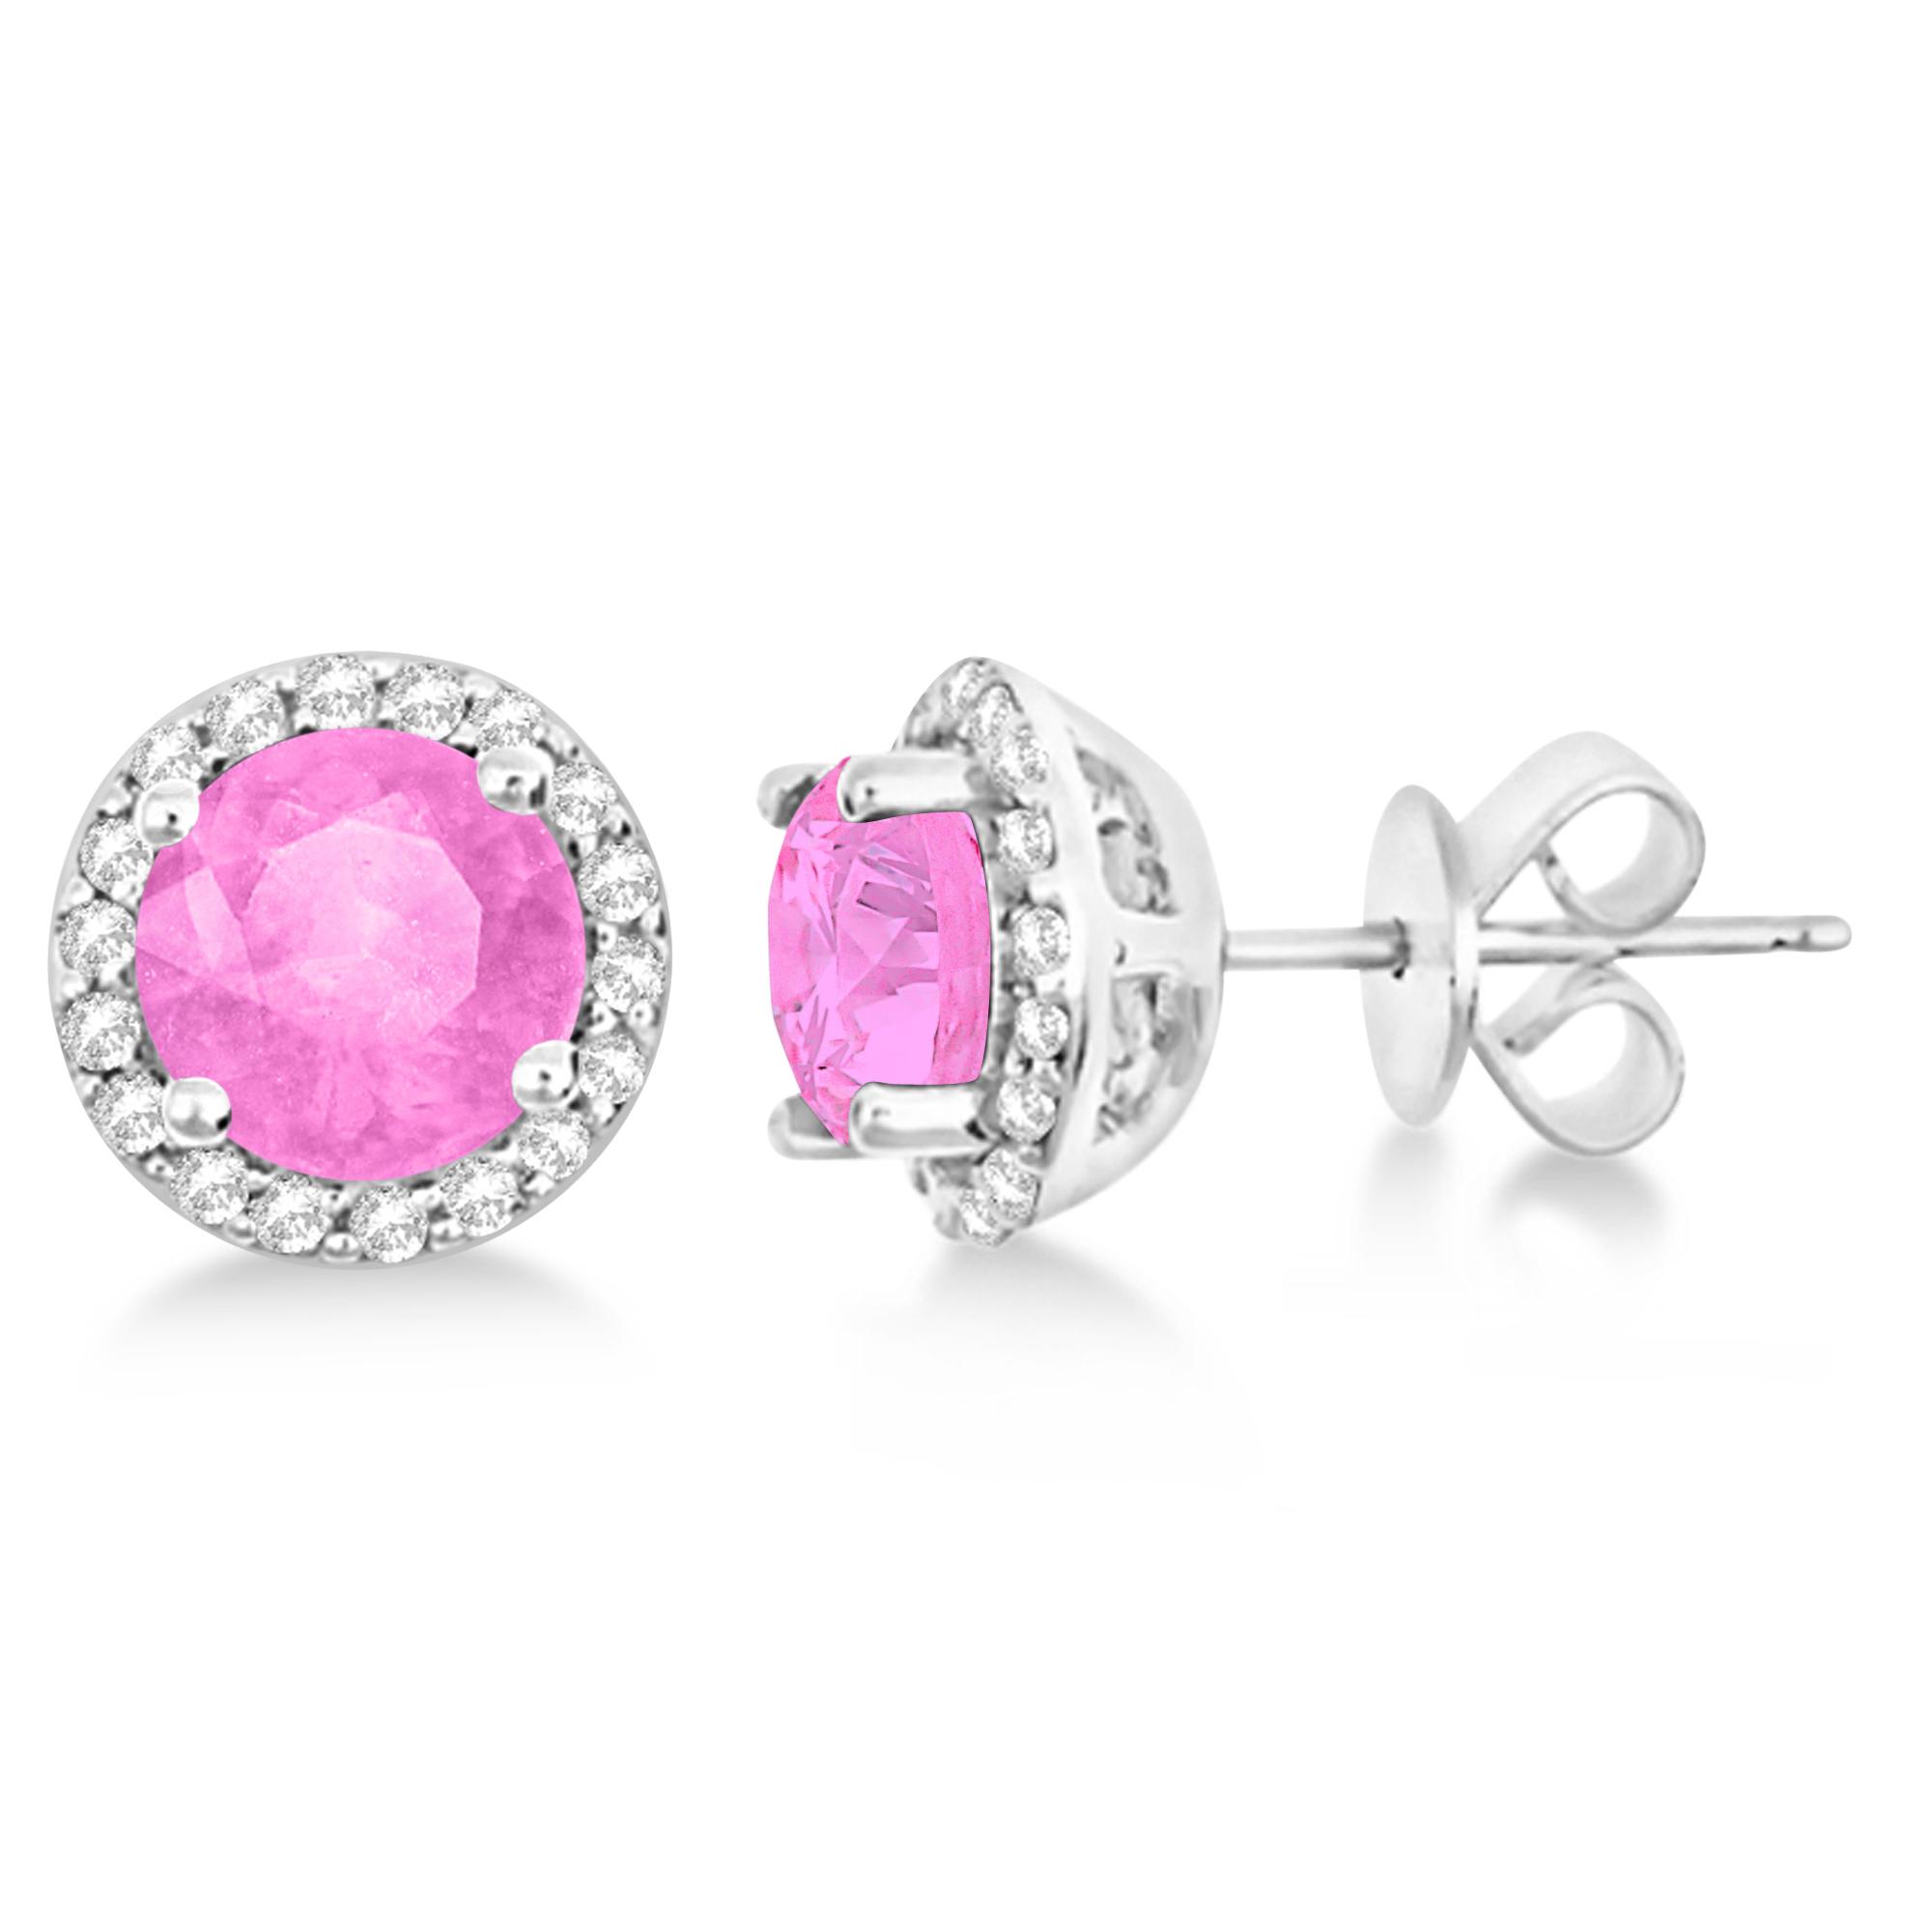 Pink Sapphire & Diamond Halo Stud Earrings in Sterling Silver 2.27ct